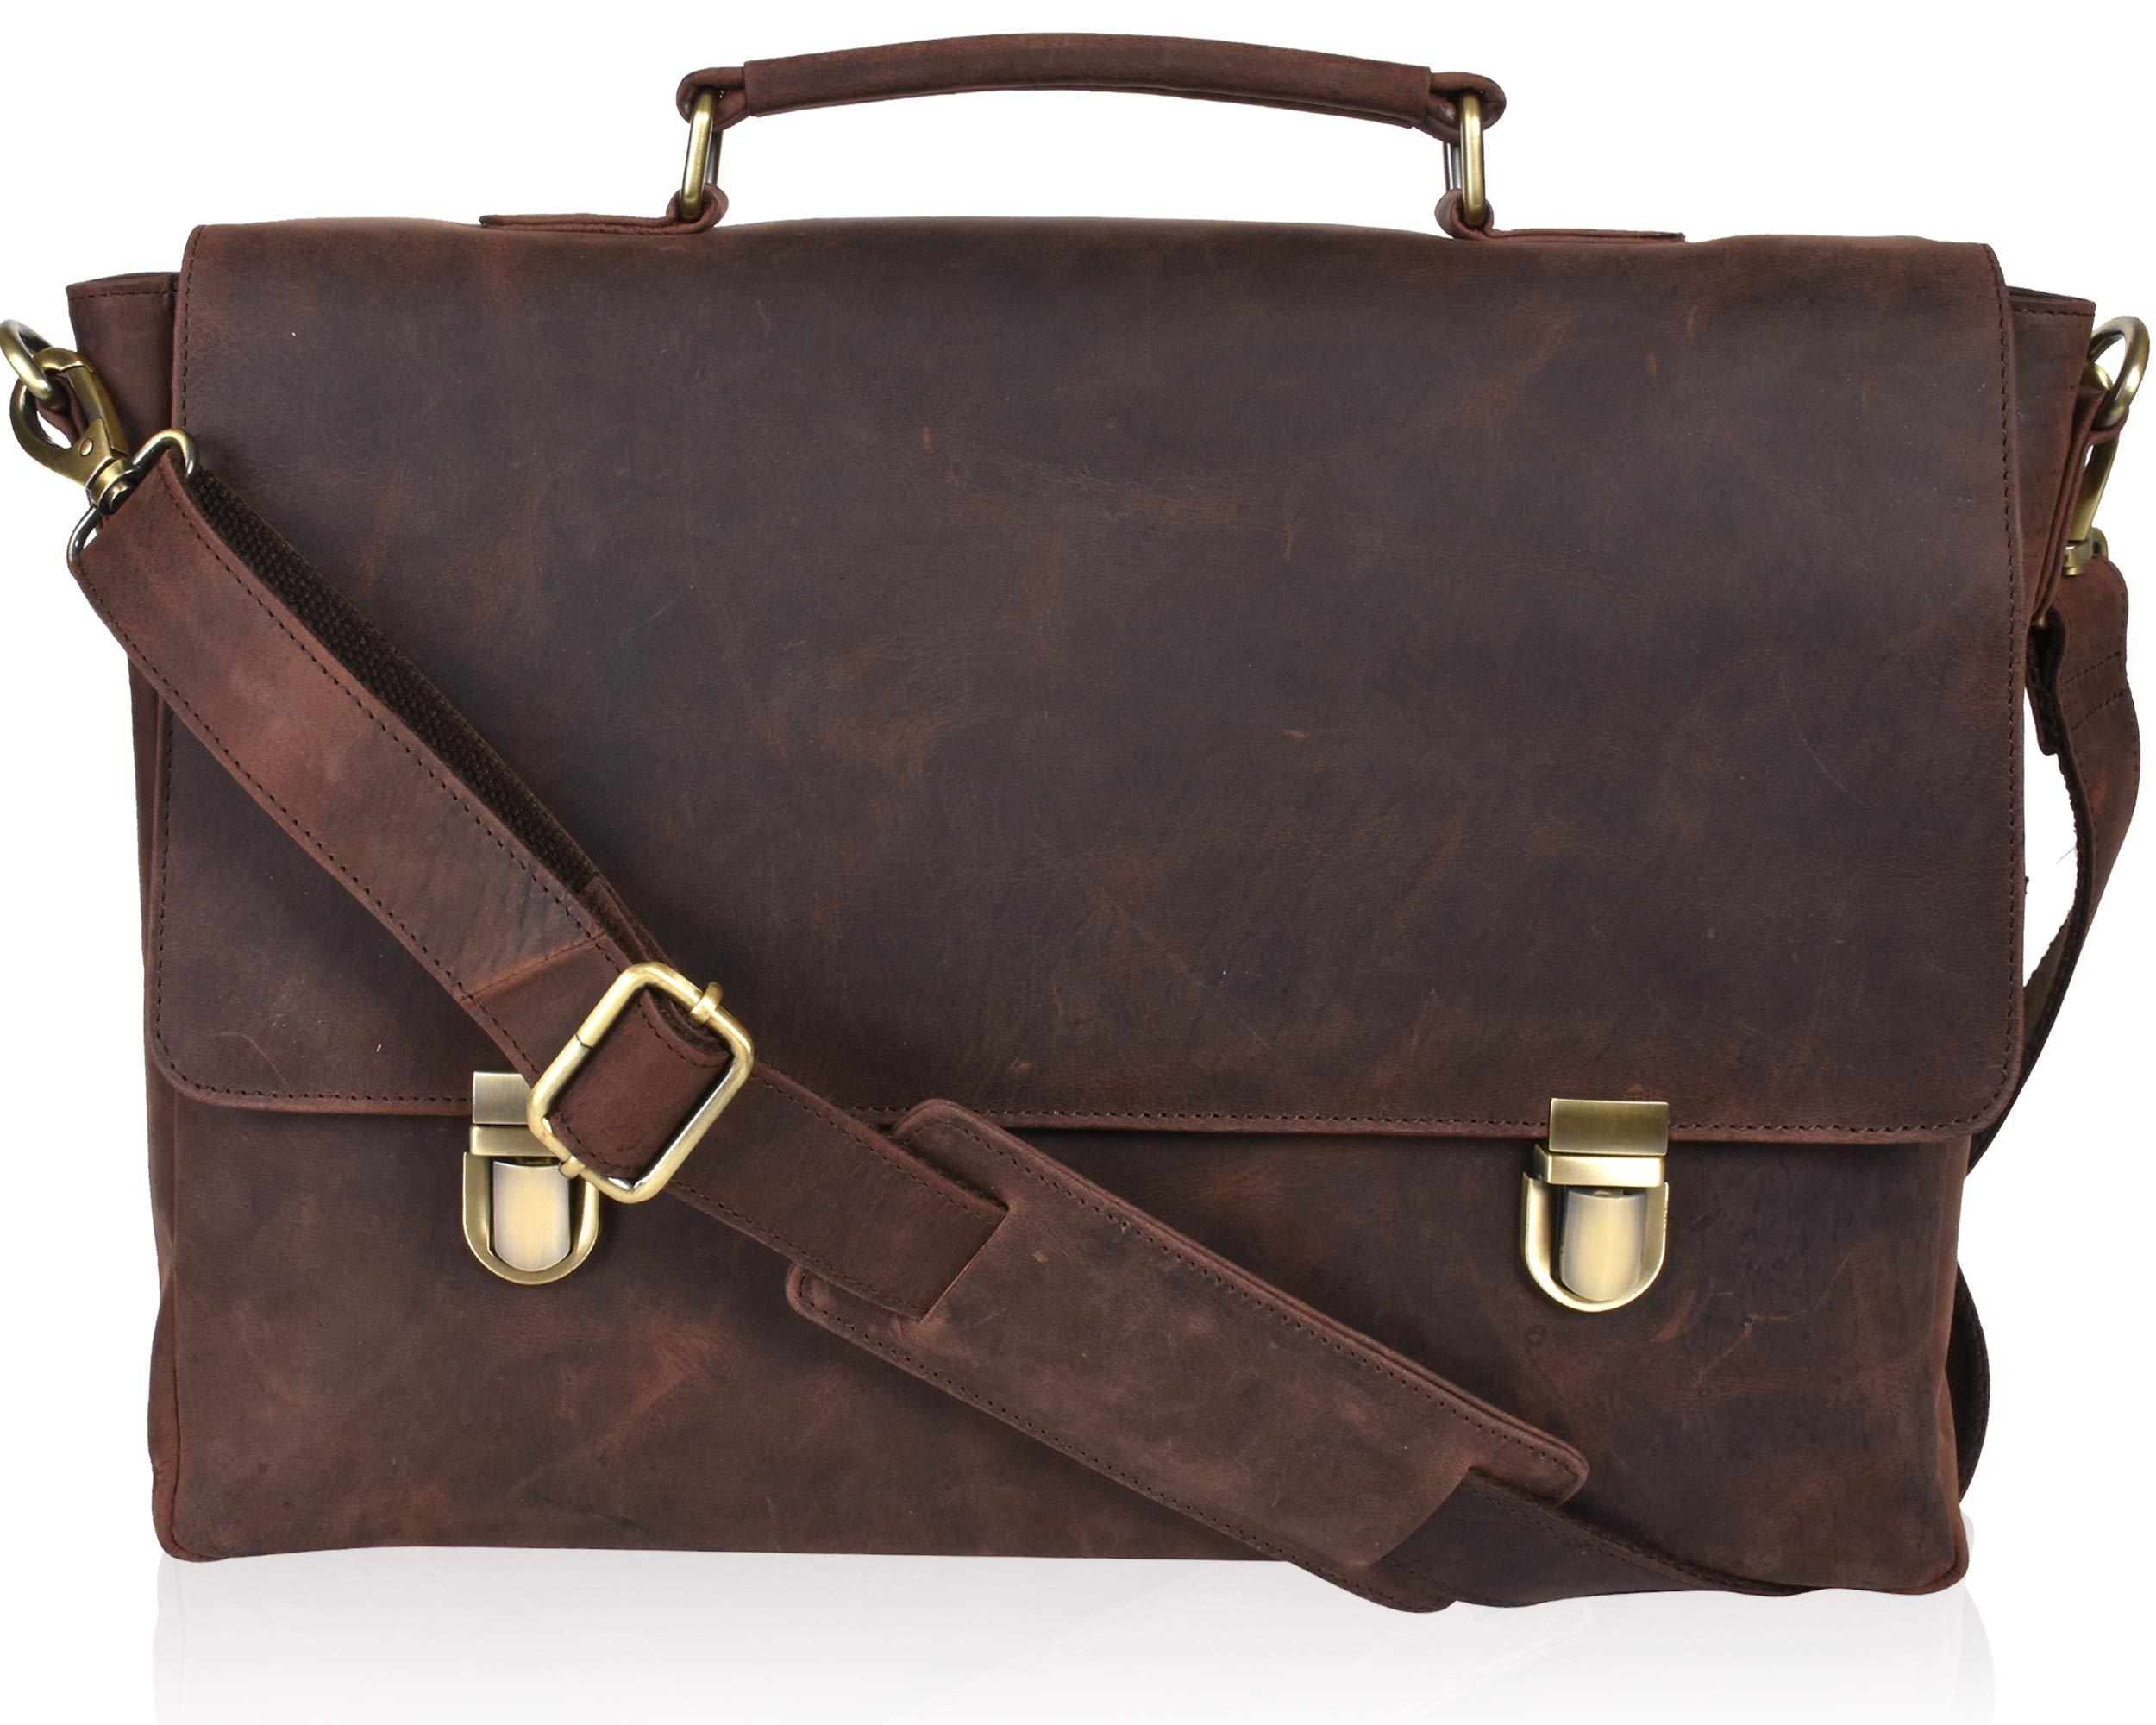 Offie Briefcase Laptop Satchel Bags Leather Messenger Bag for Men /& Women